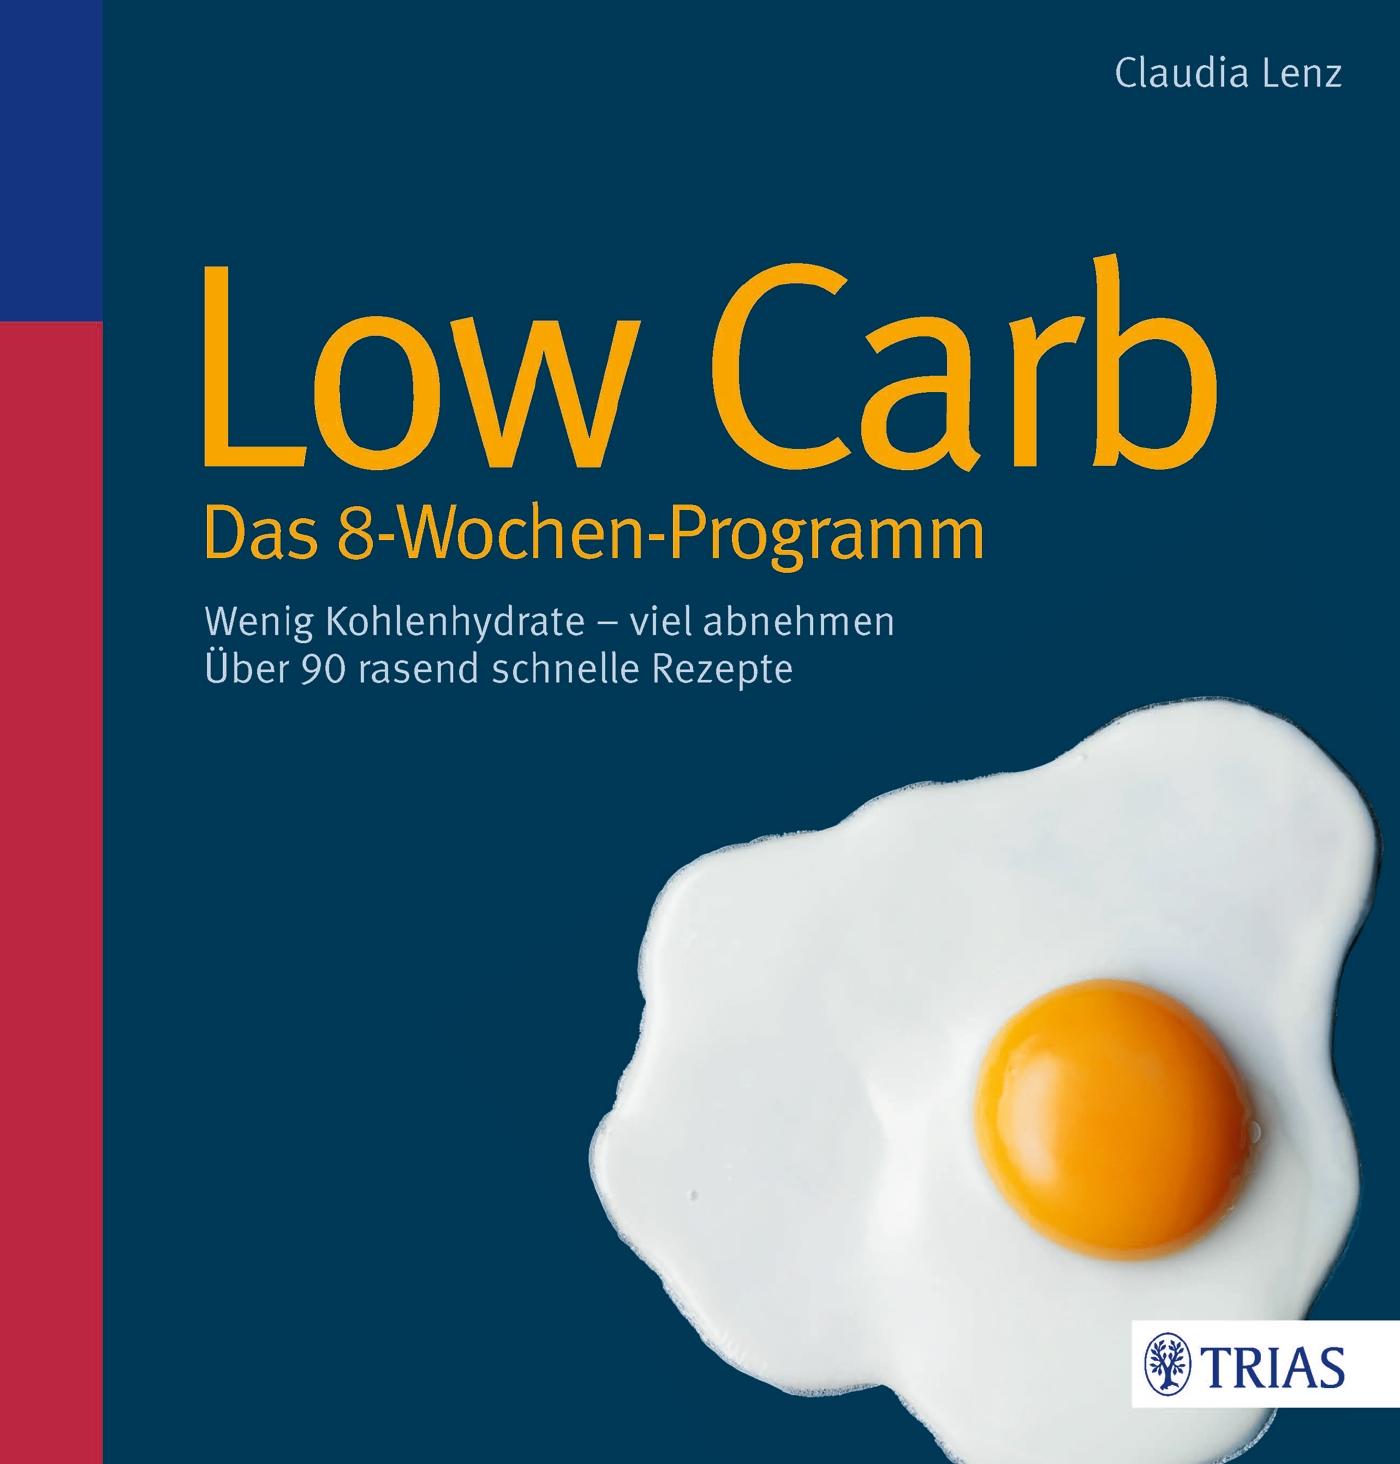 Low Carb - Das 8-Wochen-Programm: Wenig Kohlenhydrate - viel abnehmen - Claudia Lenz